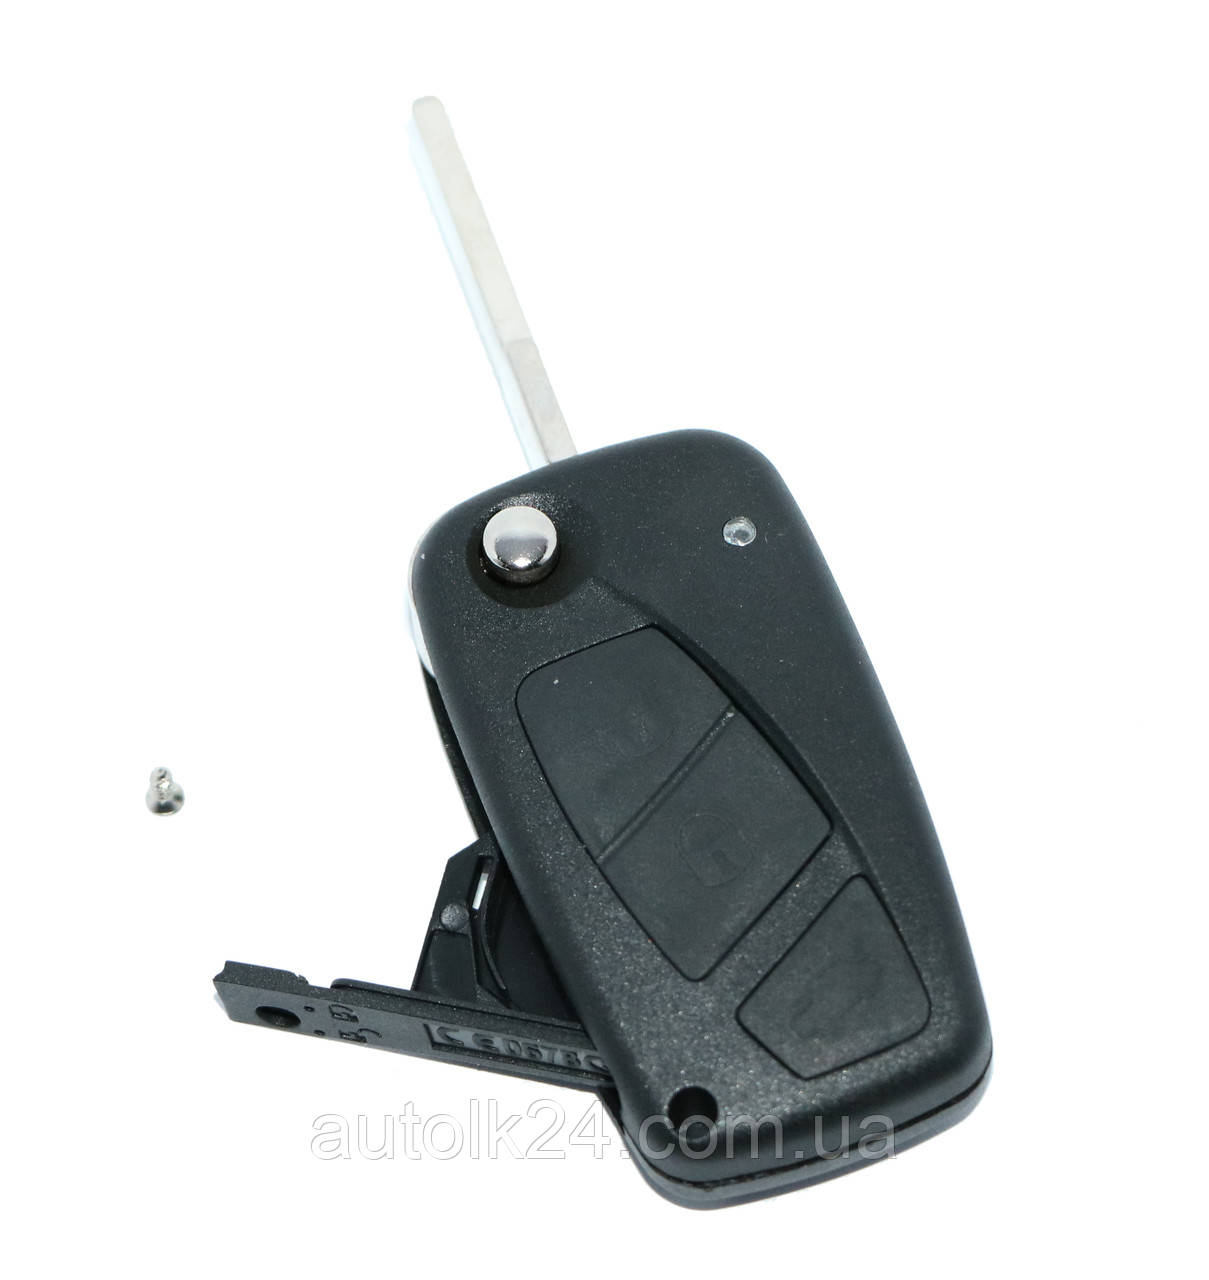 Корпус выкидного ключа Fiat Ducato,PUNTO,Doblo,Bravo 3 кнопки, лезо SIP22